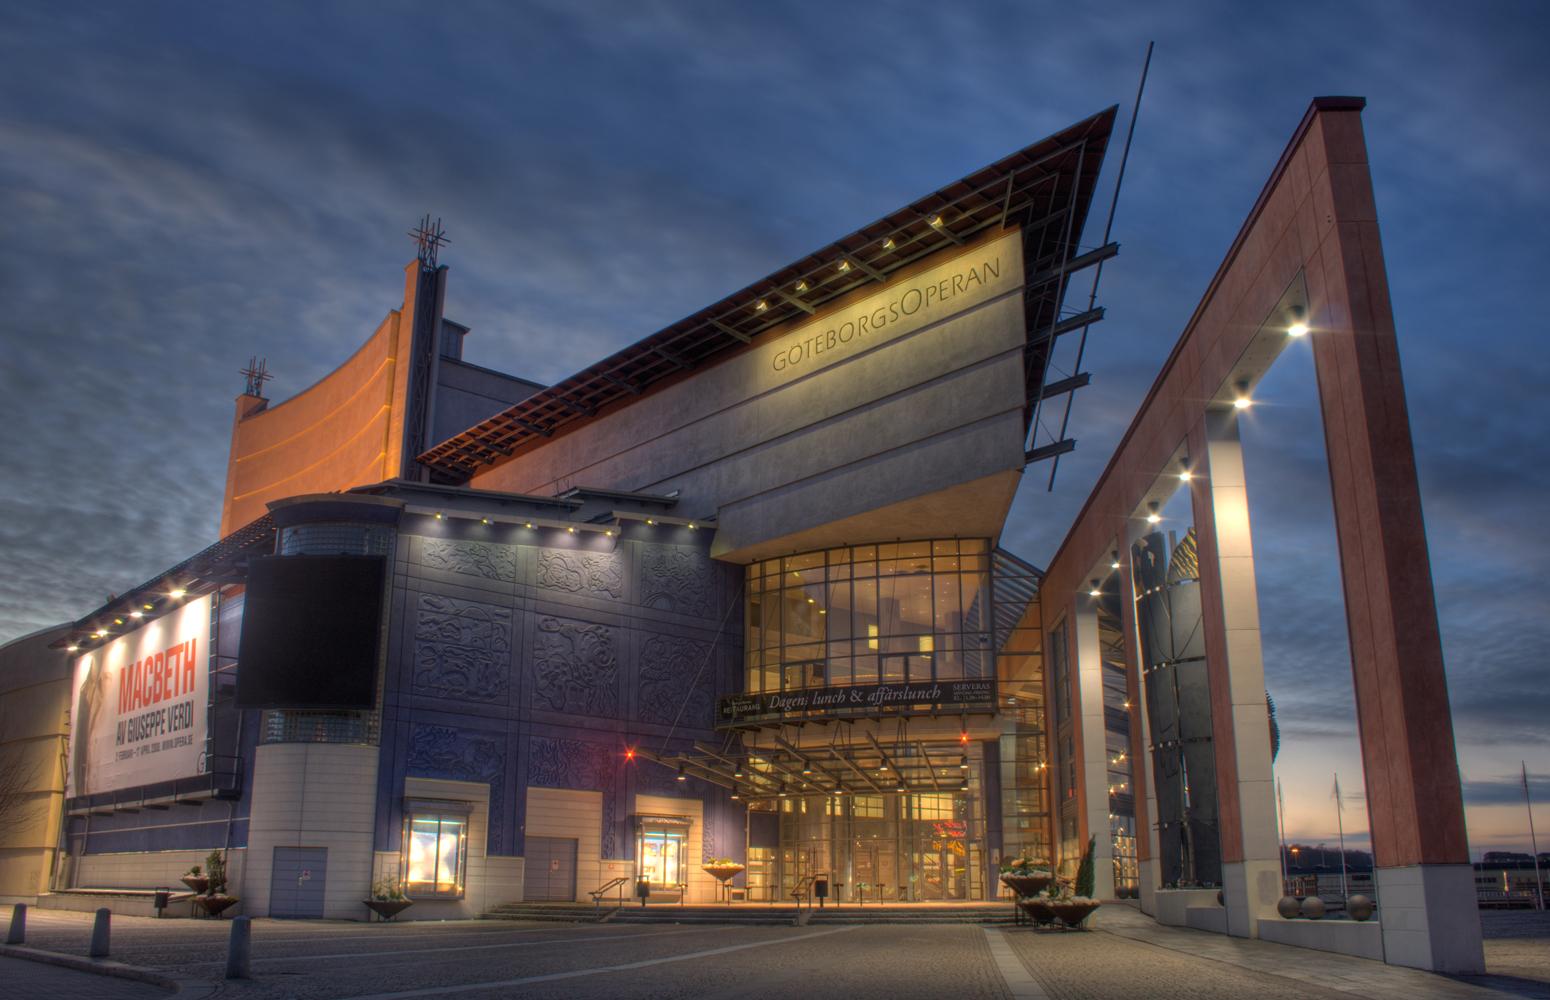 ec056091a7d2 Göteborgsoperan – Wikipedia